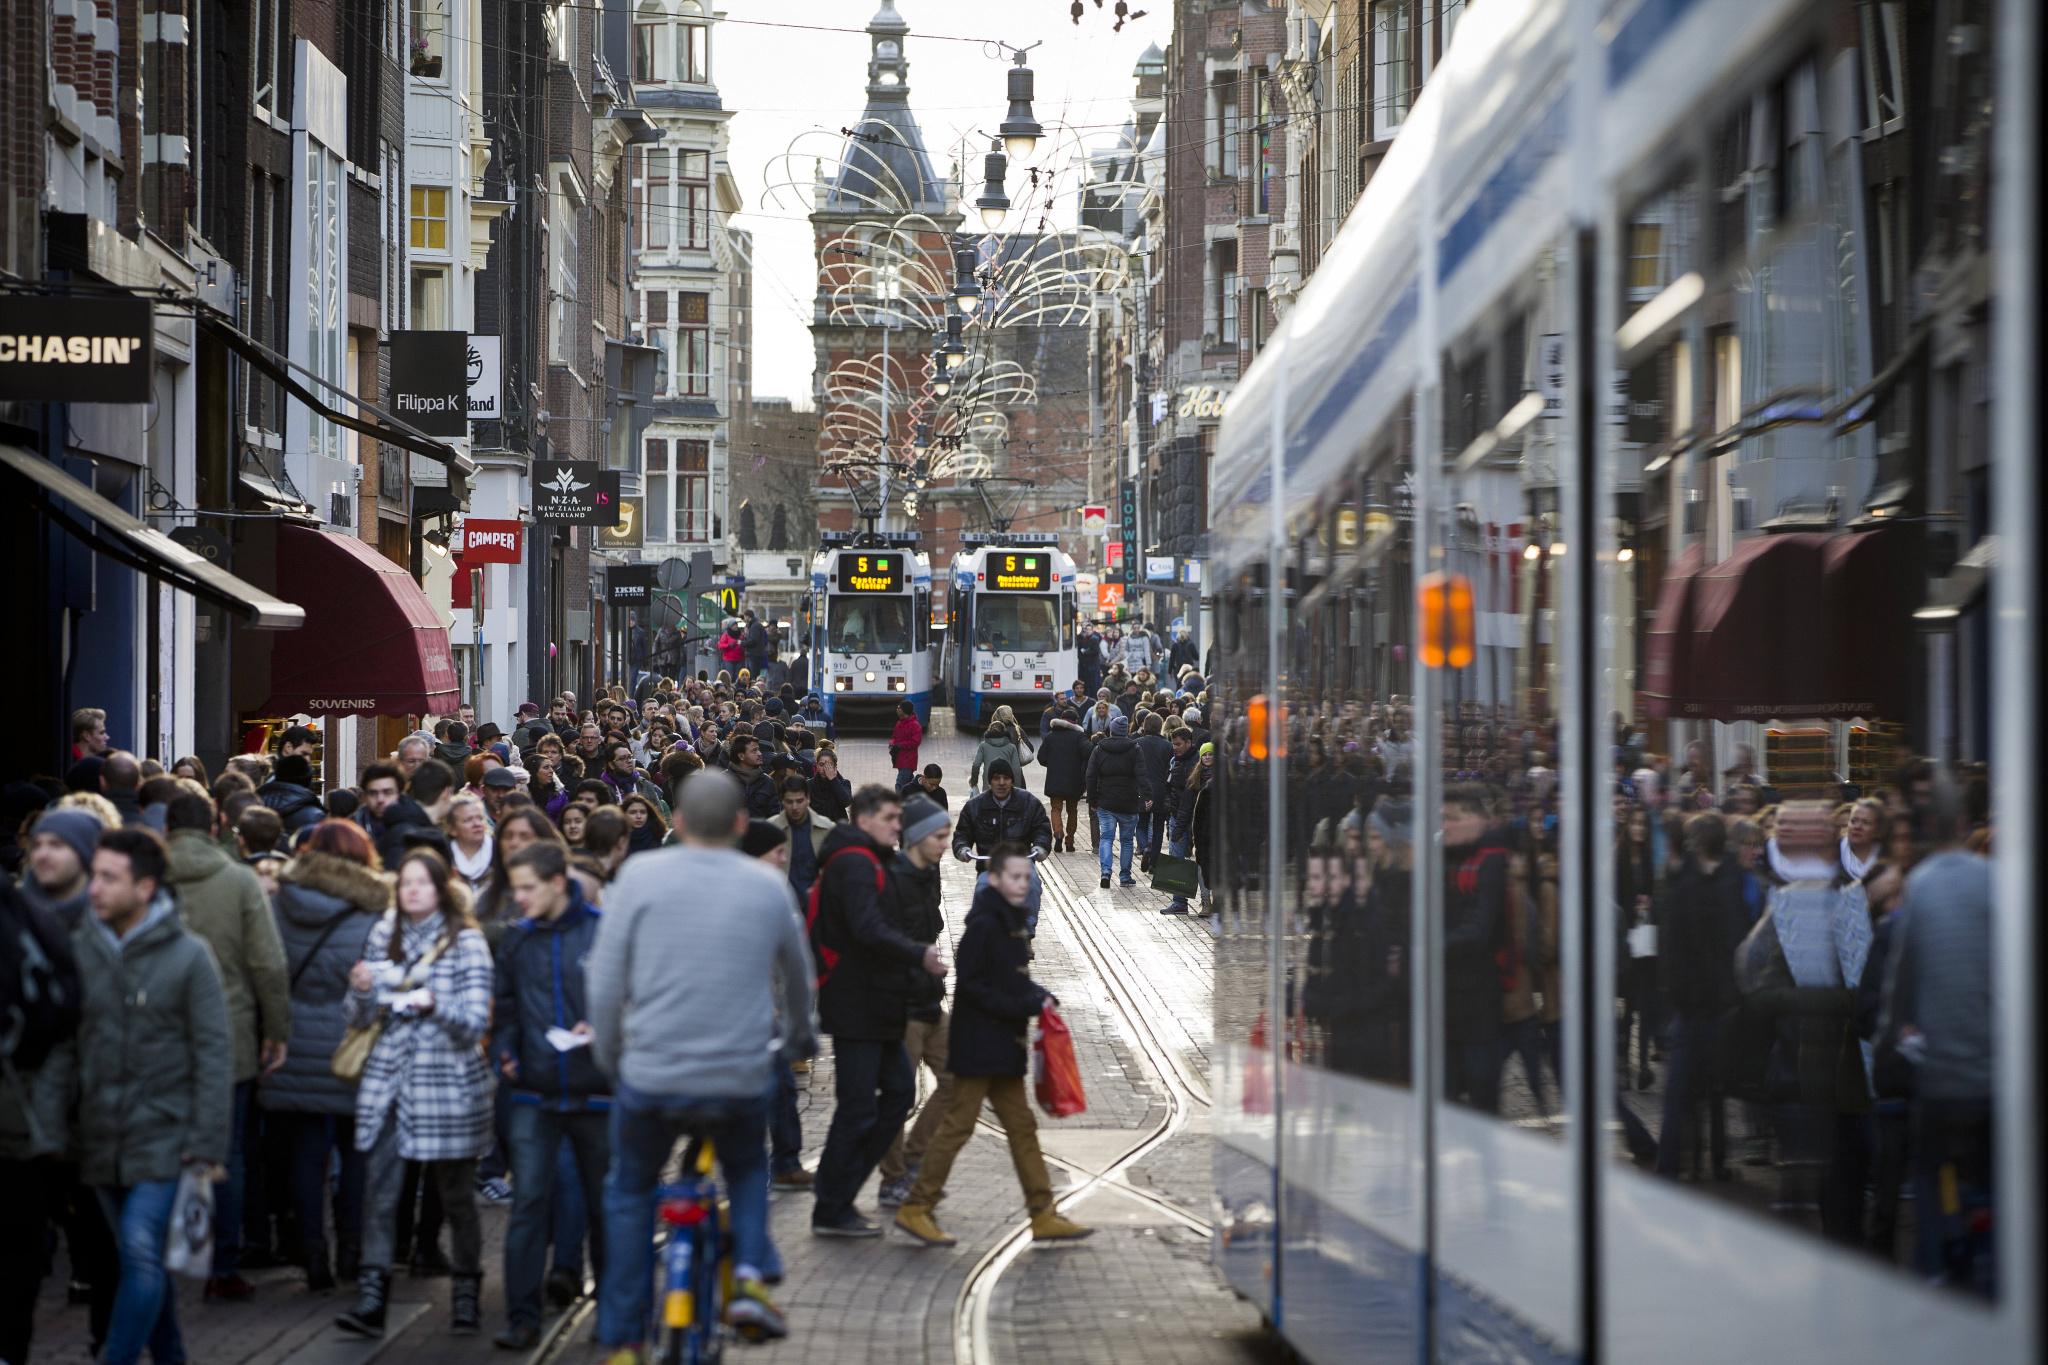 Figure 3- Pedestrian and streetcar traffic on the Leidsestraat in Amsterdam (Eigenphoto, 2014)